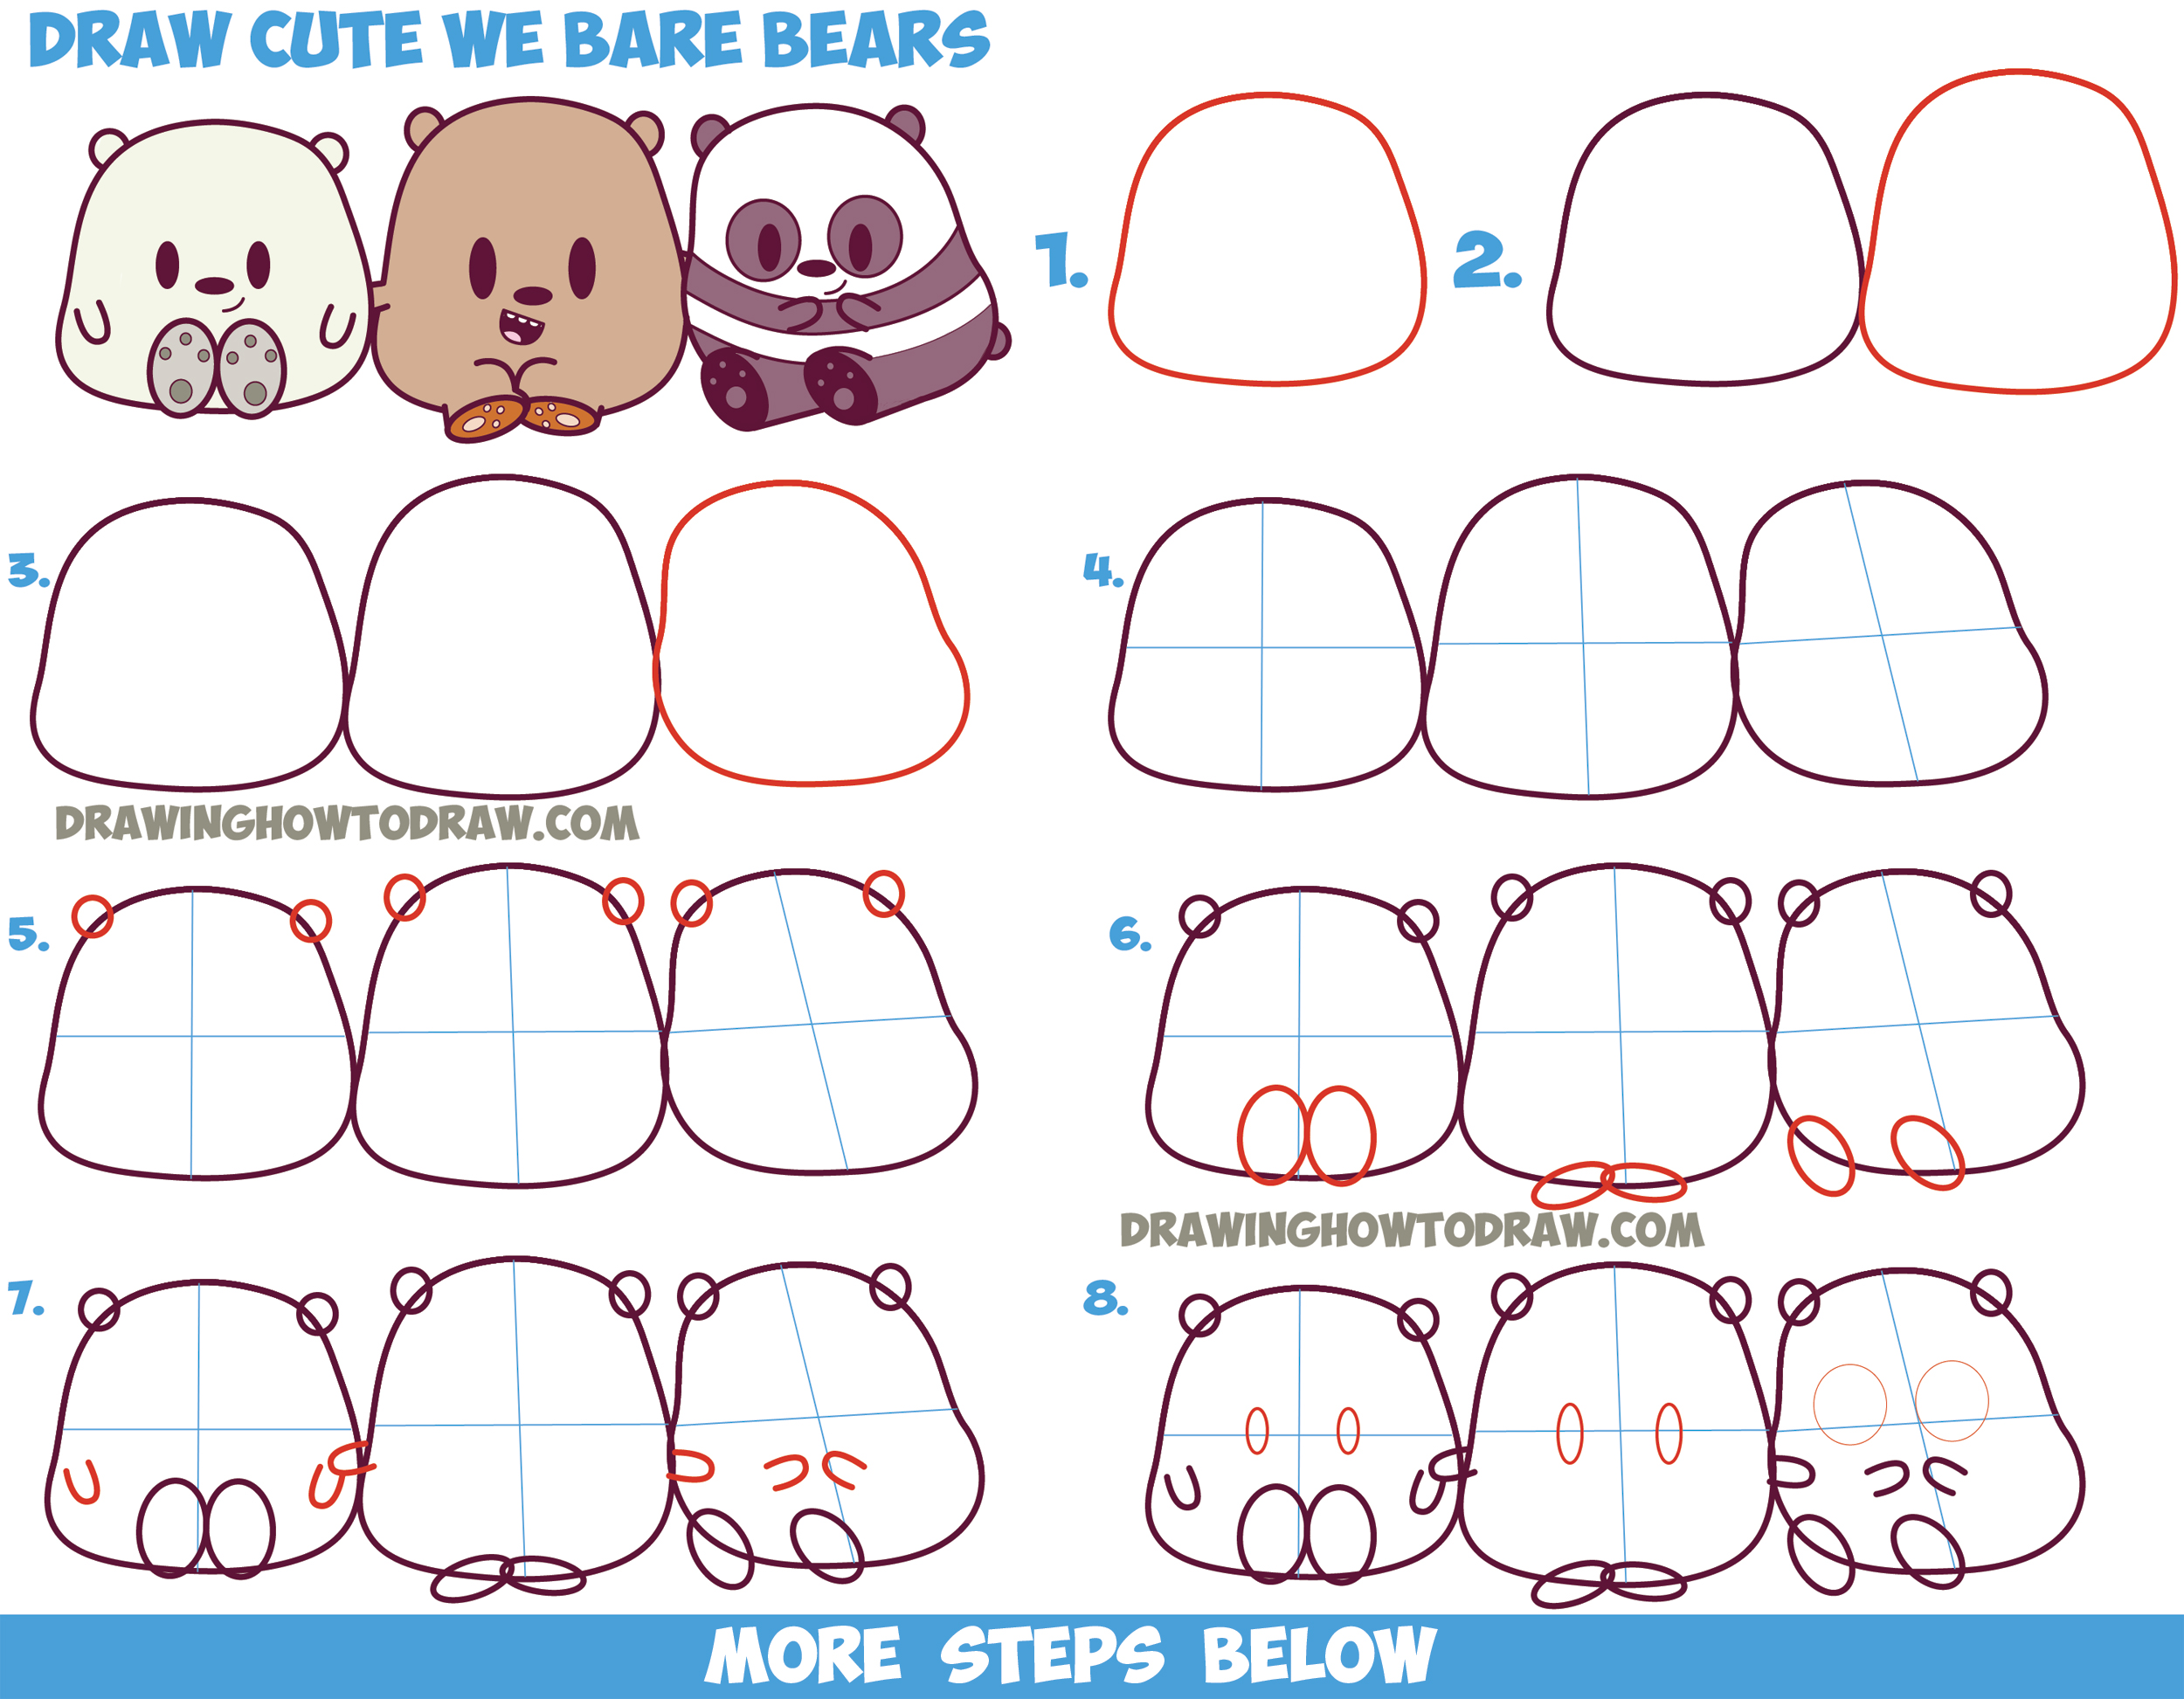 2500x1945 How To Draw We Bare Bears (Cute Kawaii Chibi Baby Style